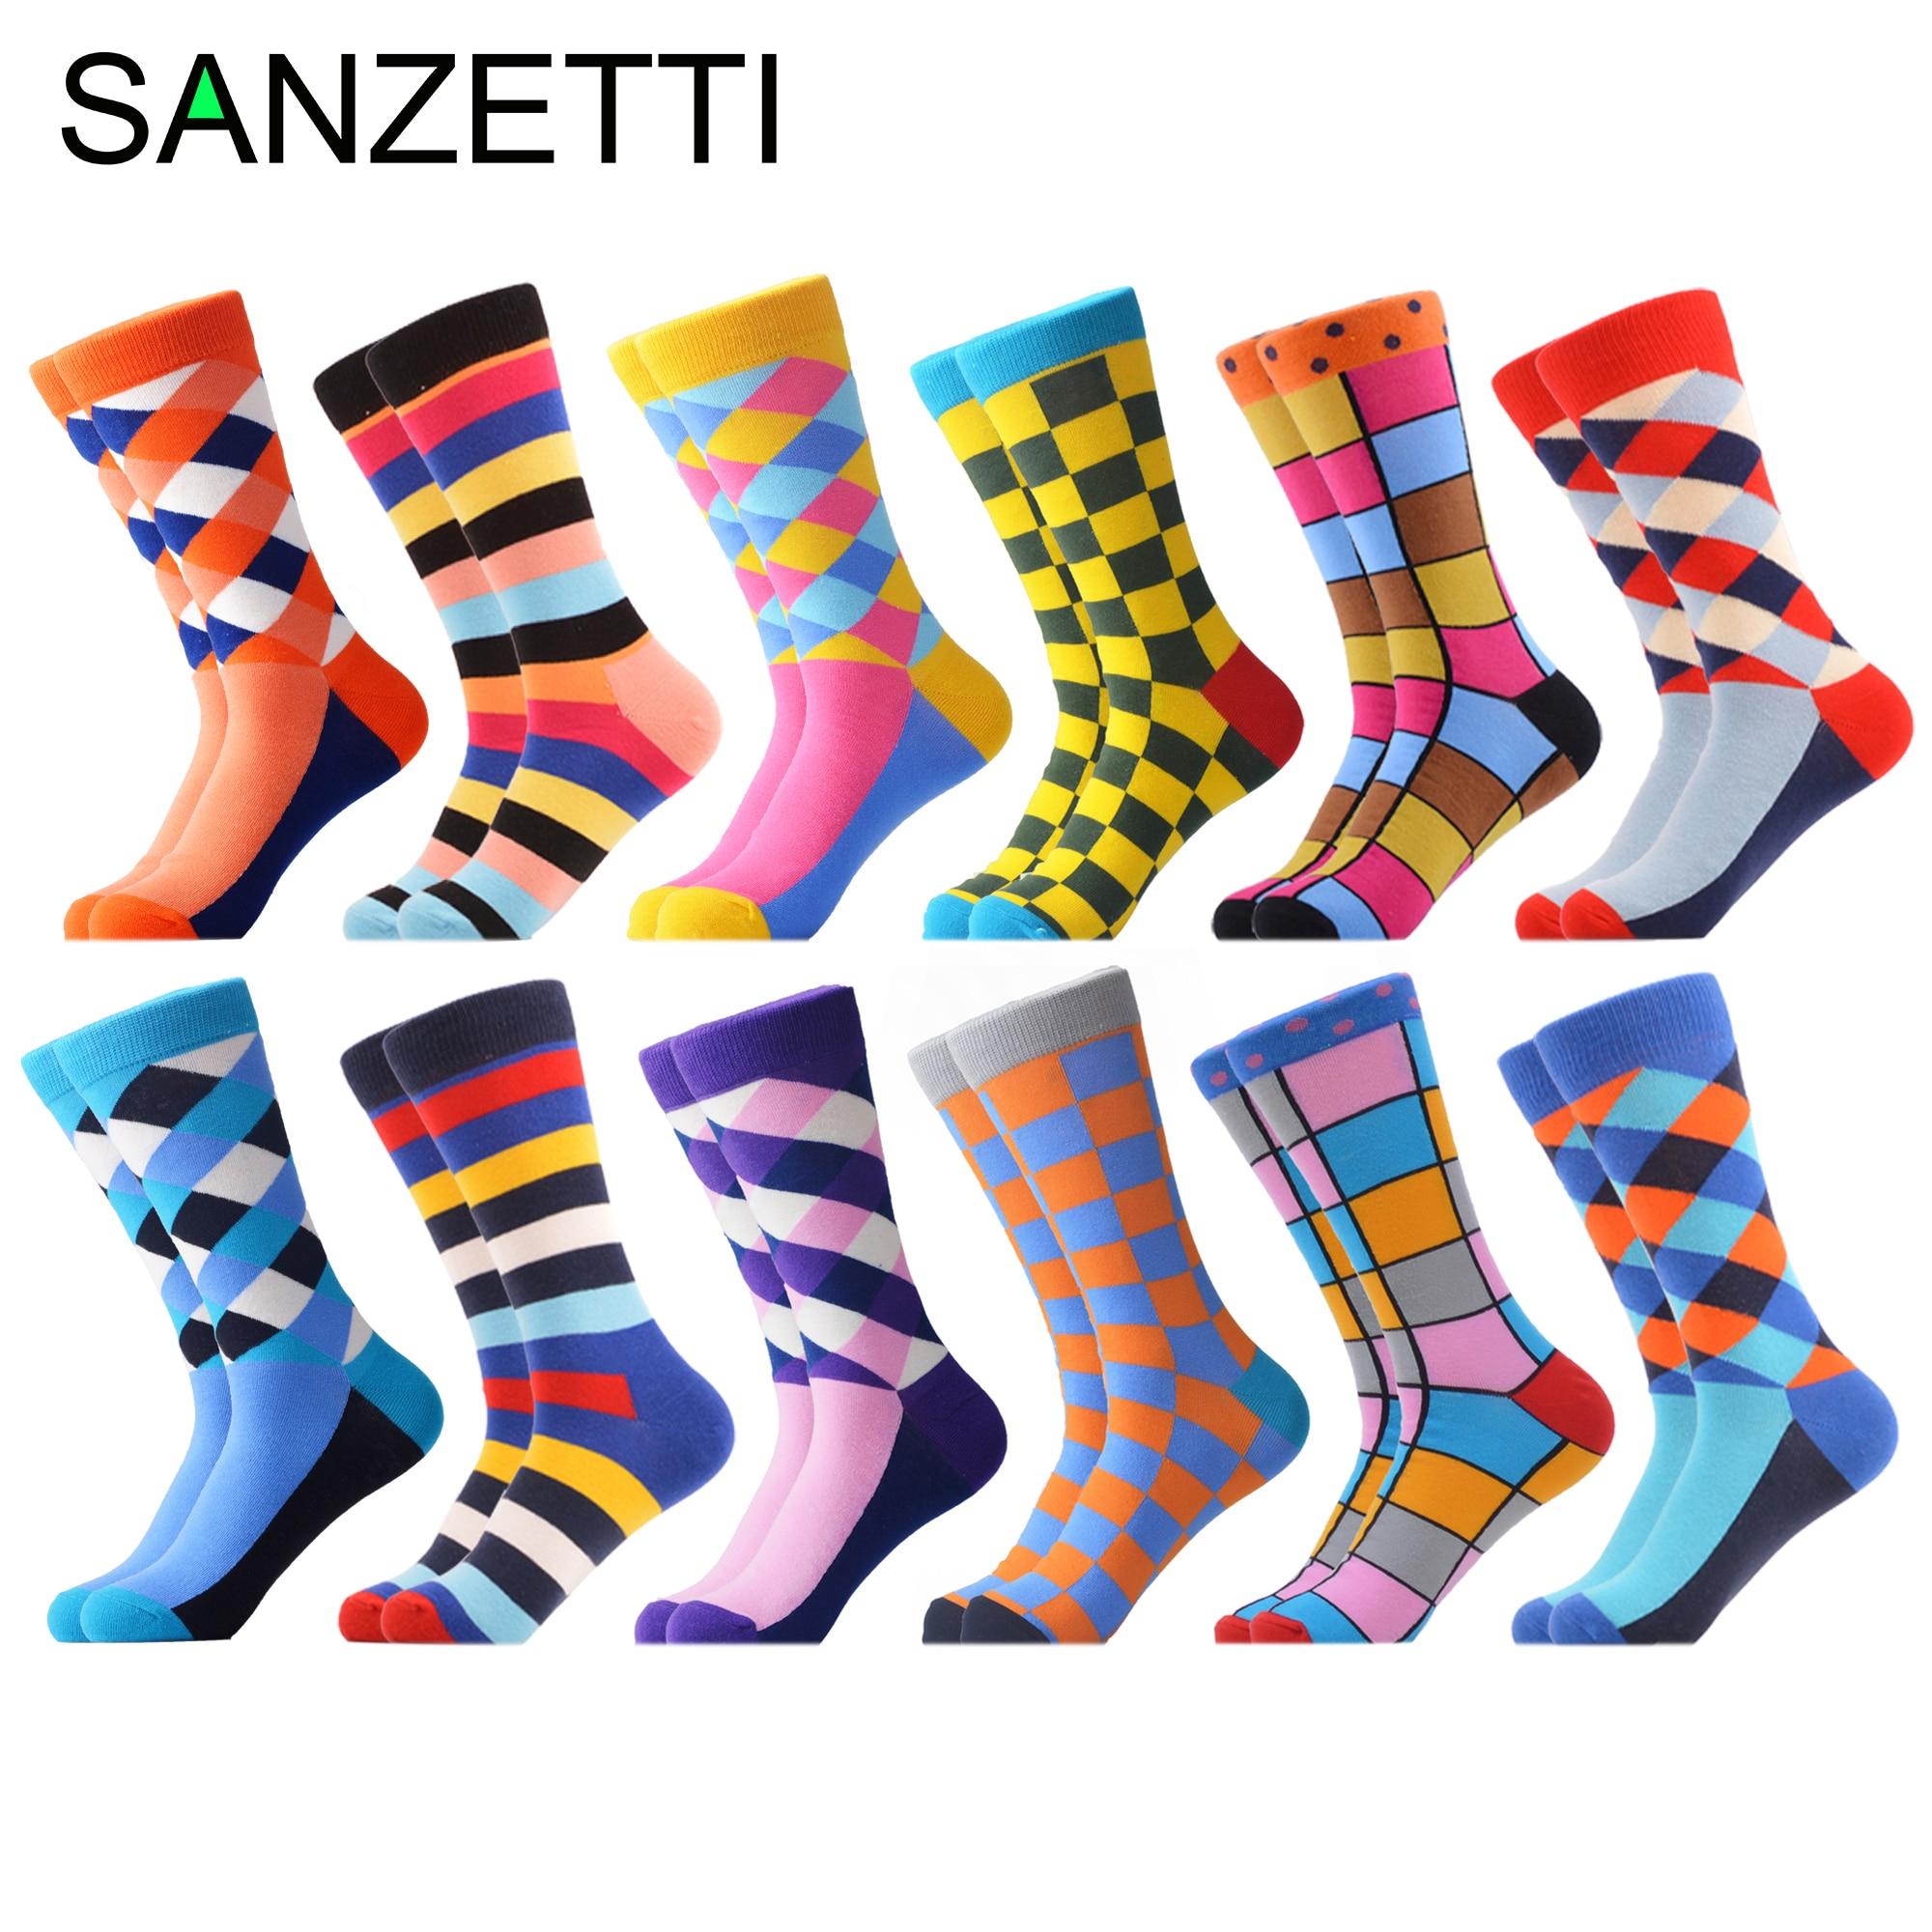 SANZETTI 12 Pairs/Lot 2020 Newest Winter Warm Colorful Men's Casual Combed Cotton Happy Crew Socks Novelty Dress Wedding Socks